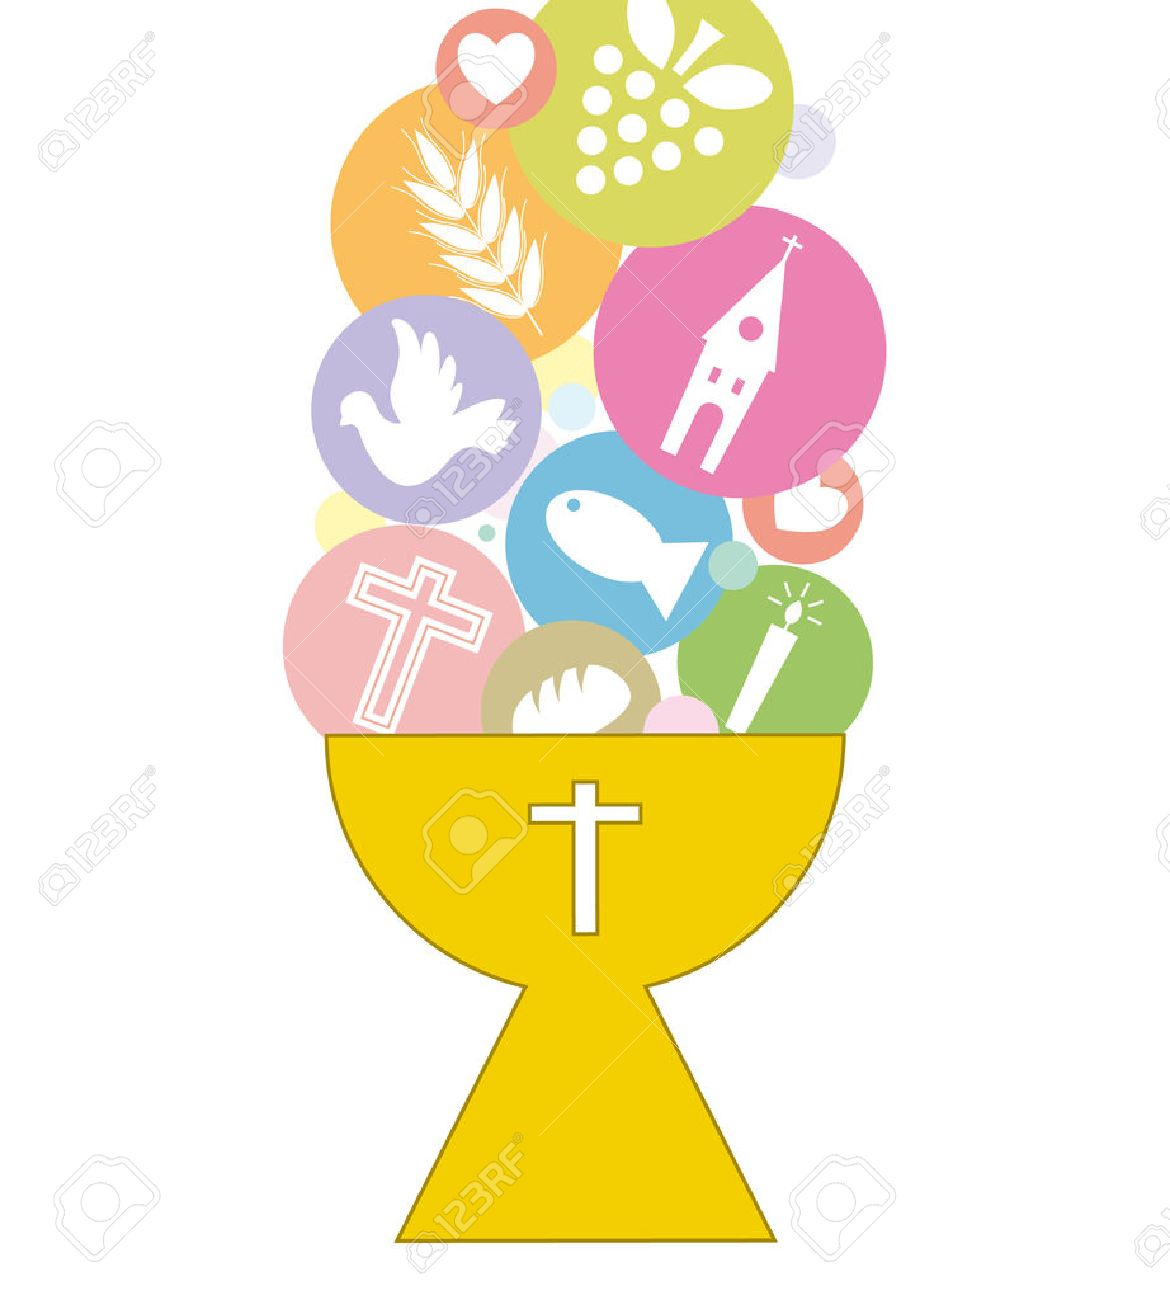 First Communion Invitation Card Stock Vector - 25126764